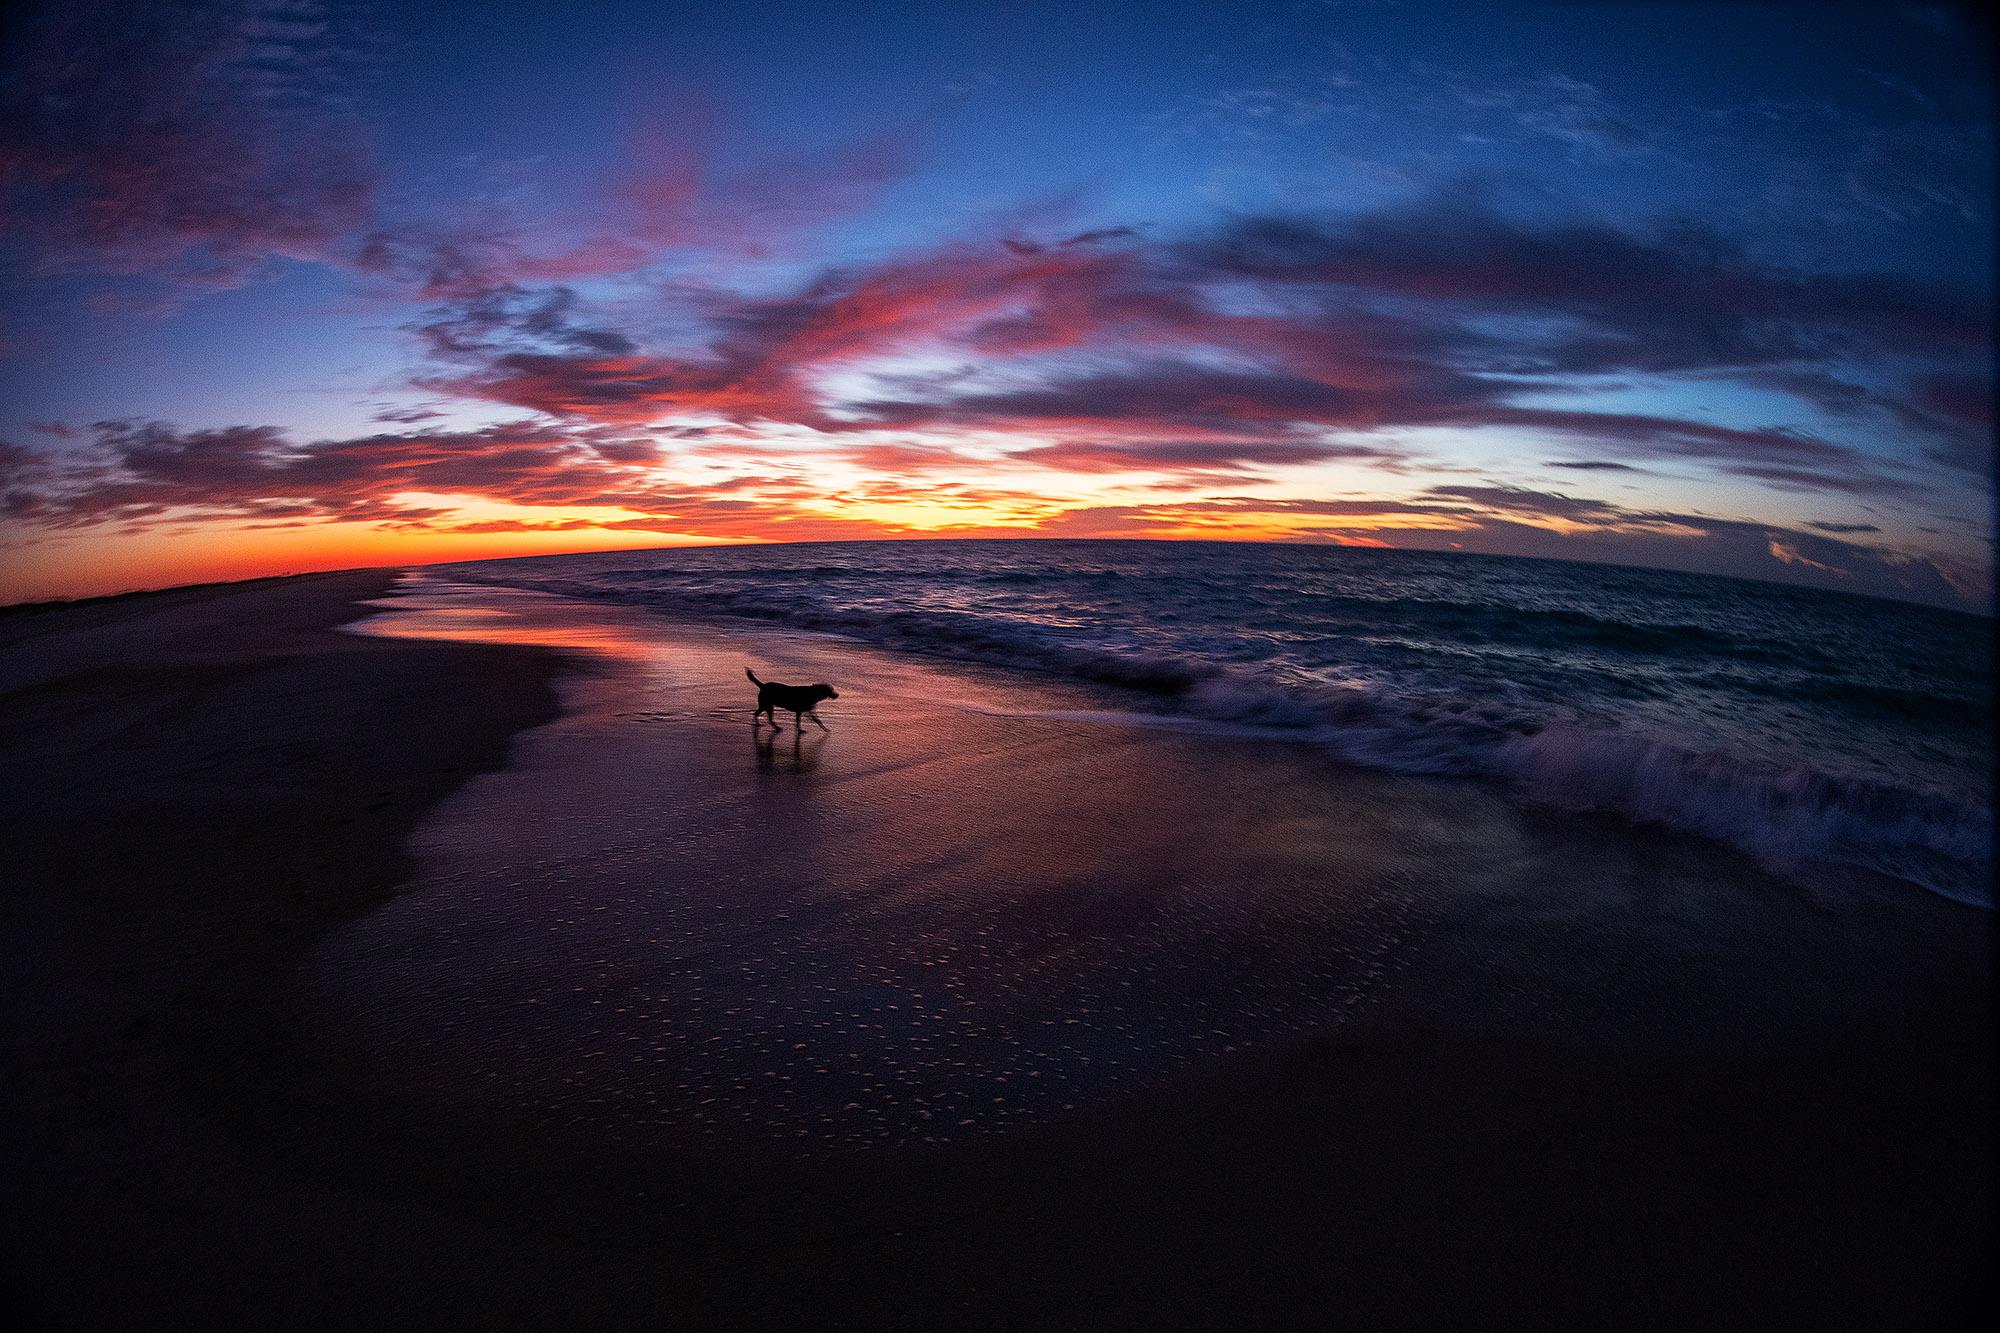 083119pod_sunrisedog5